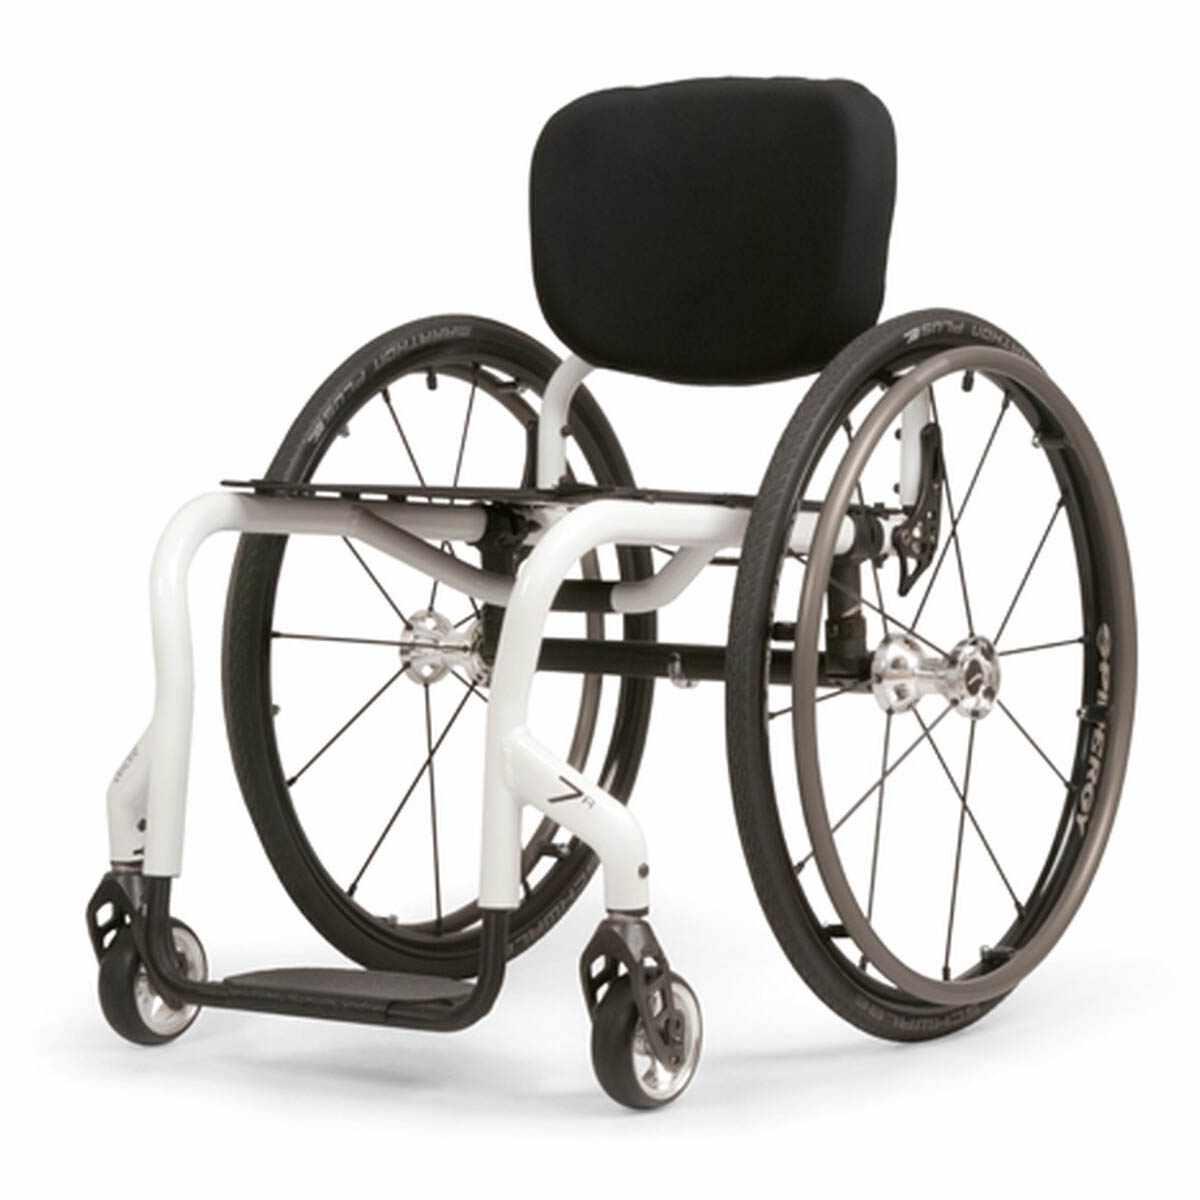 Quickie 7R rigid ultralight manual wheelchair